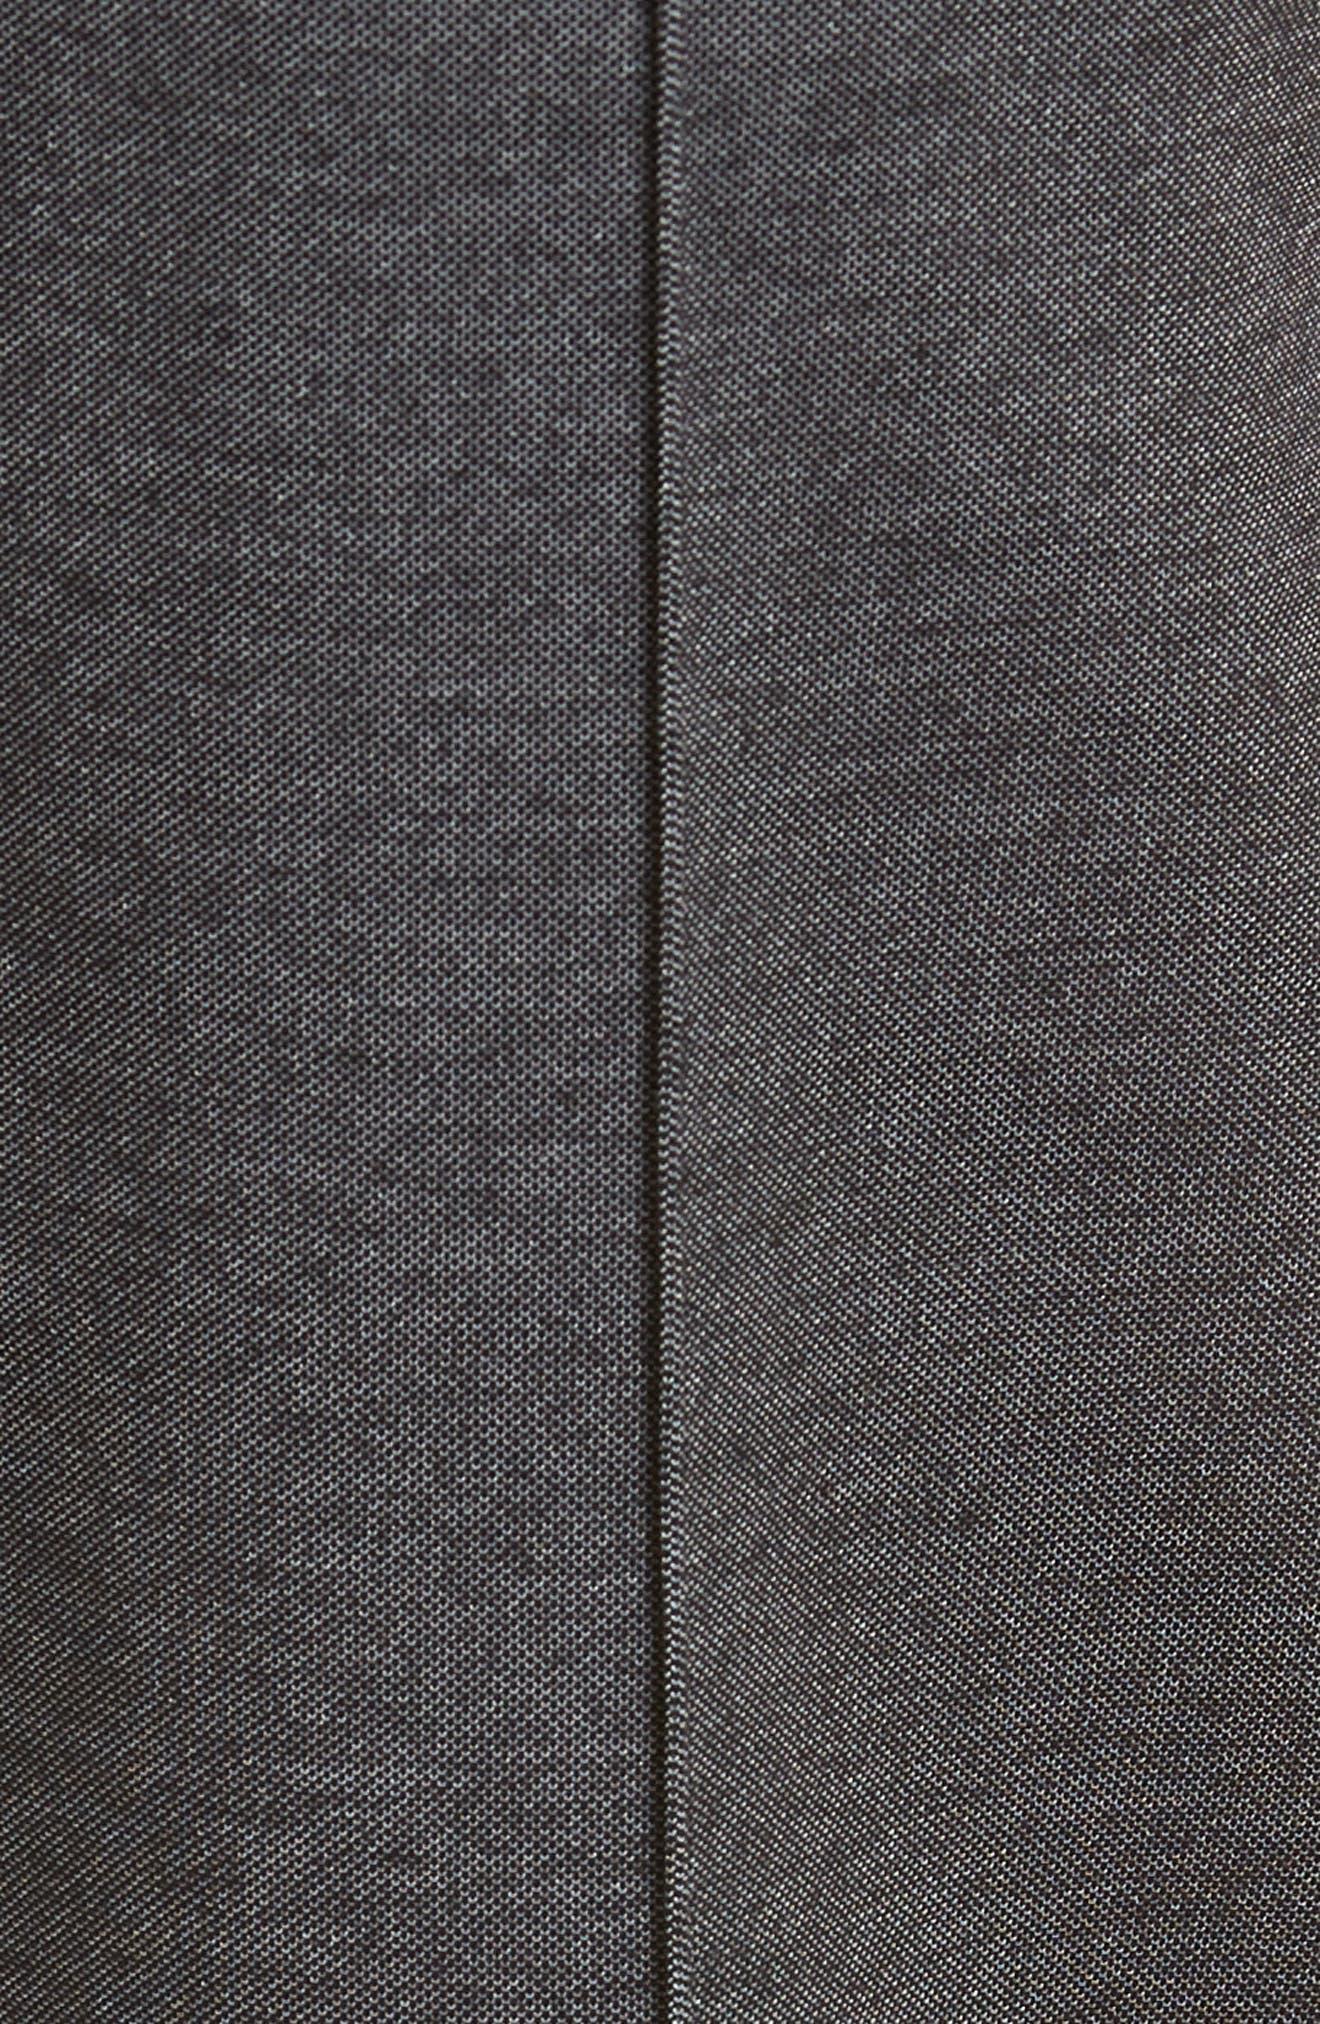 Cotton Blend Track Pants,                             Alternate thumbnail 5, color,                             BLACK